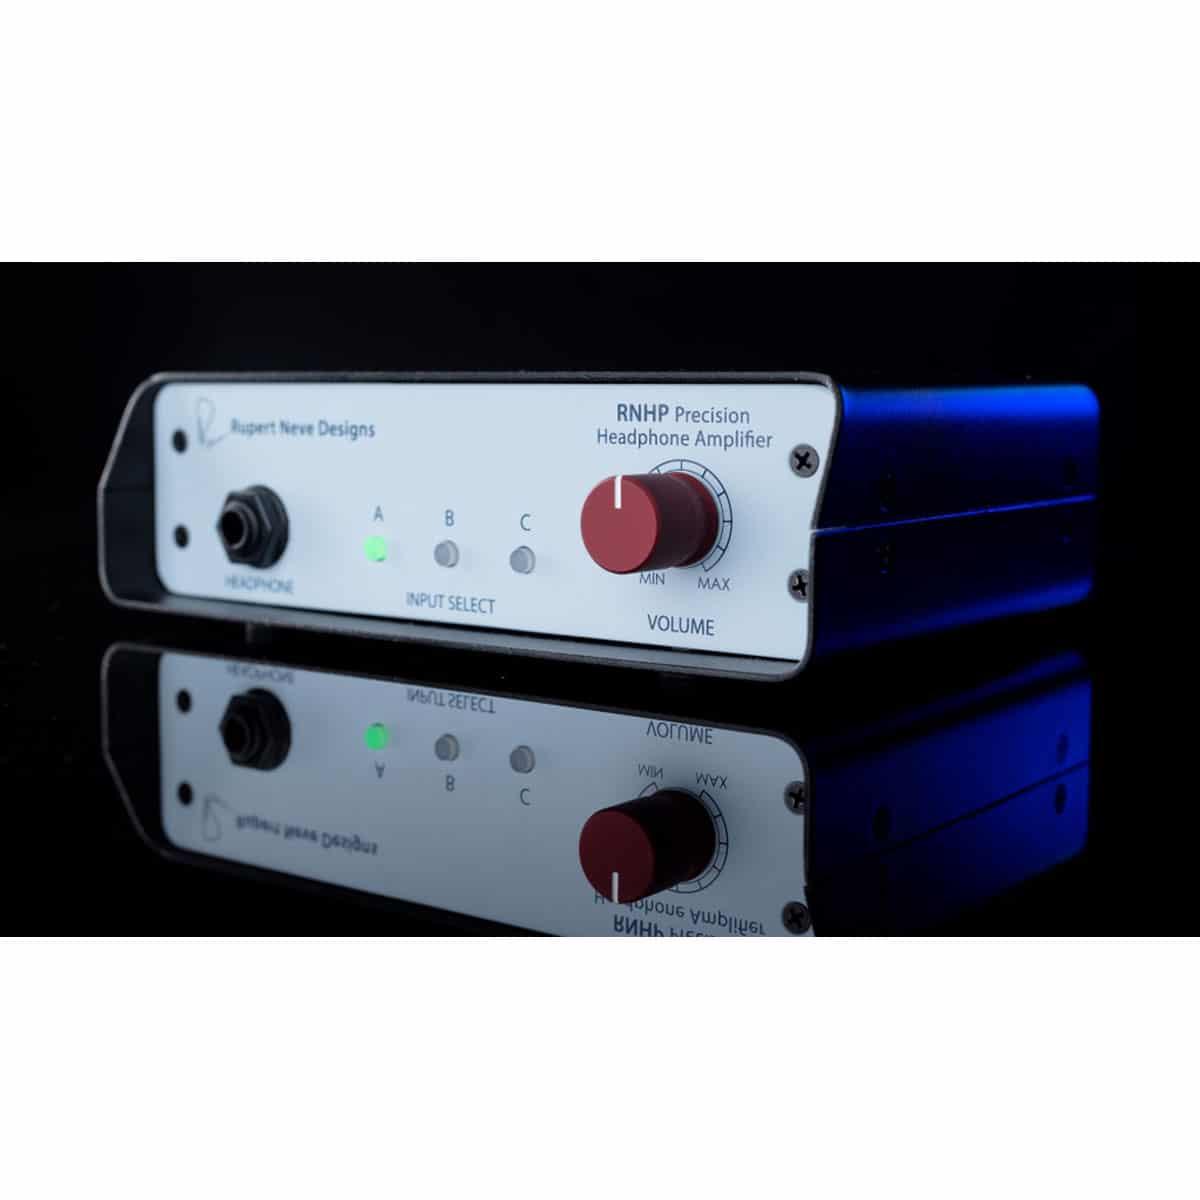 Rupert Neve RNHP 03 Amplificatori di potenza e amplificatori cuffie, Pro Audio, Audio Monitors, Cuffie